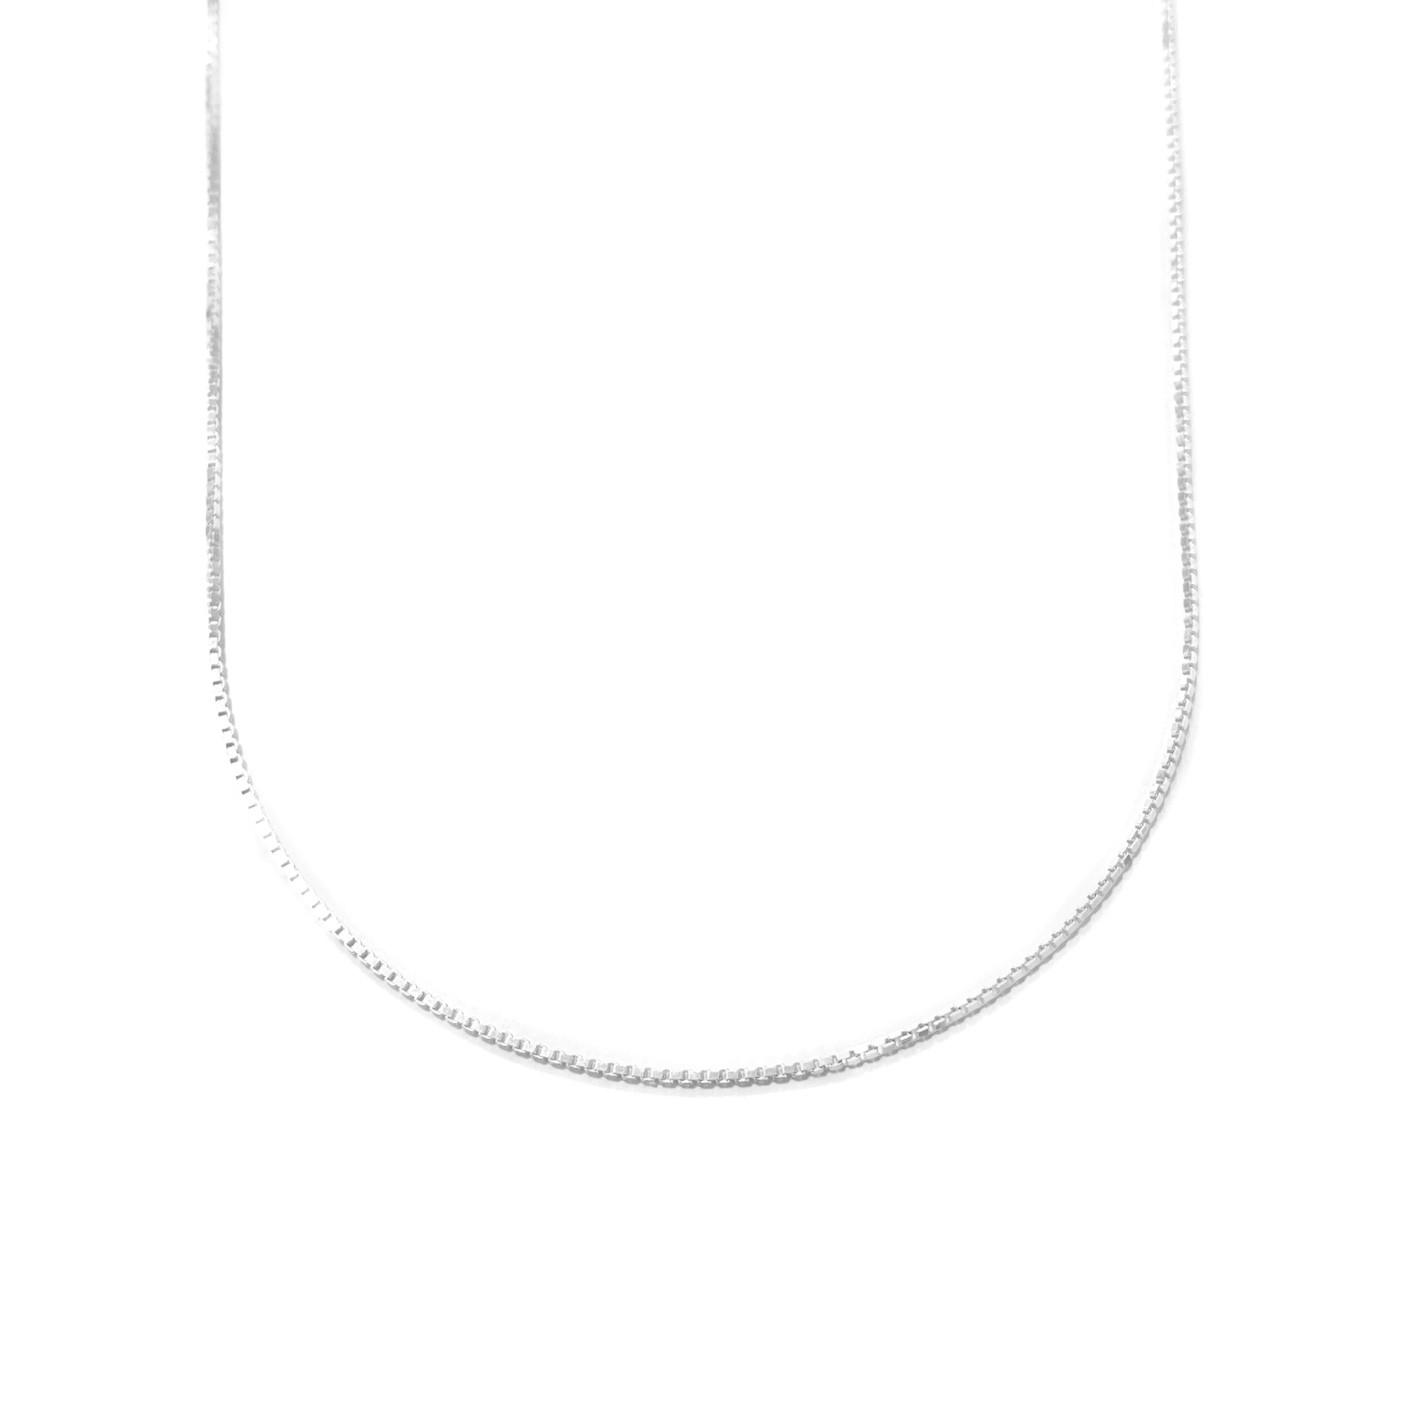 Corrente Veneziana 1,2mm 50cm (Prata 925 Italiana)